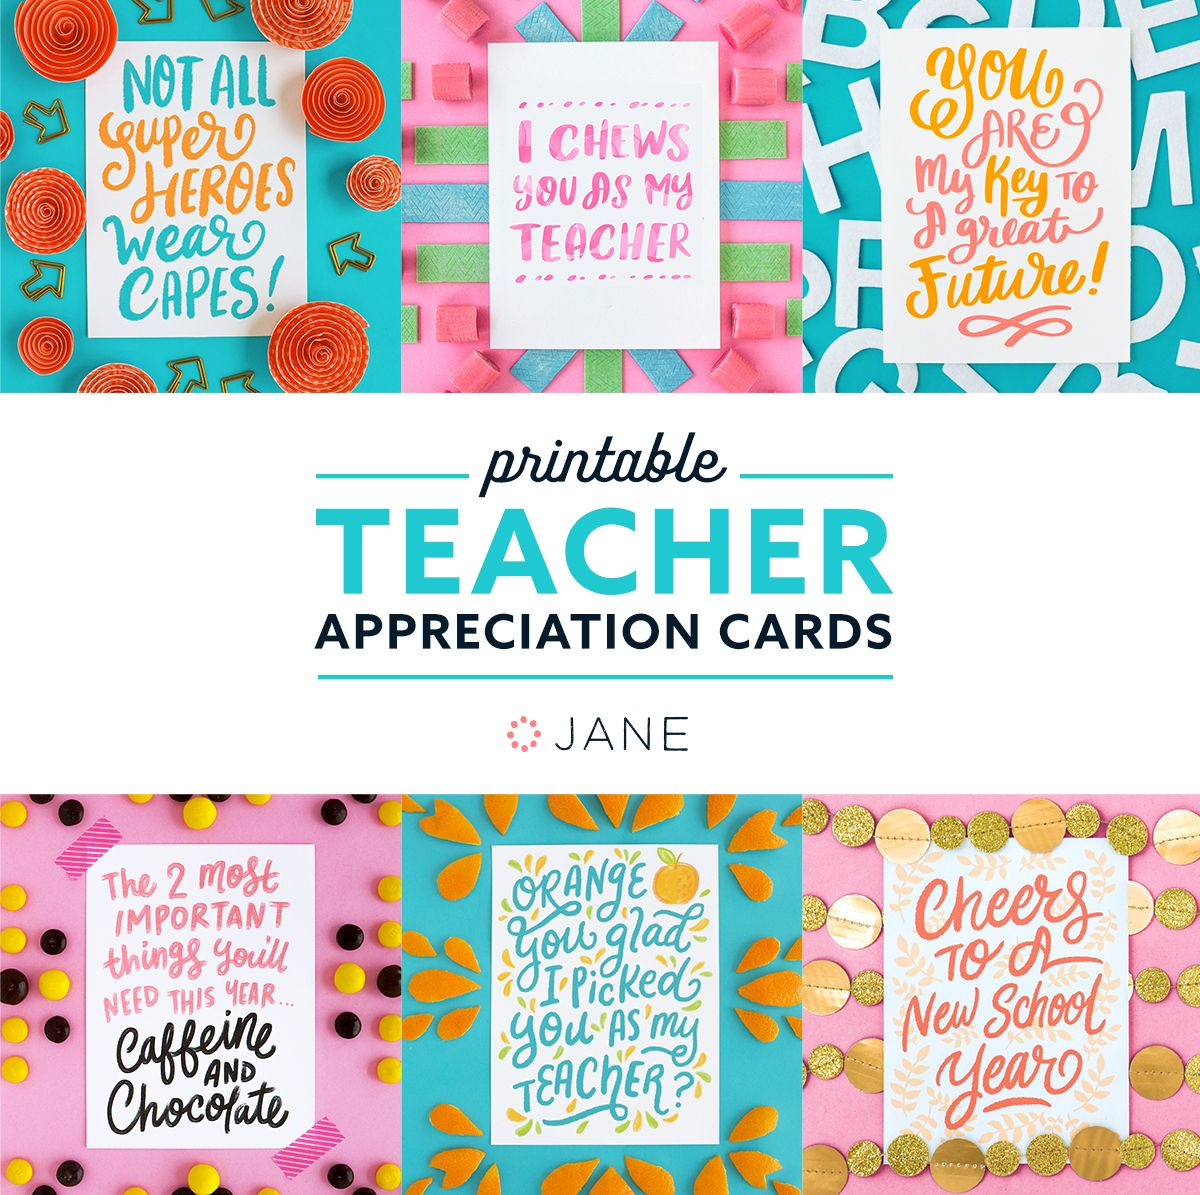 Jane Free Teacher Appreciation Printable Cards   Teacher - Free Teacher Appreciation Week Printable Cards